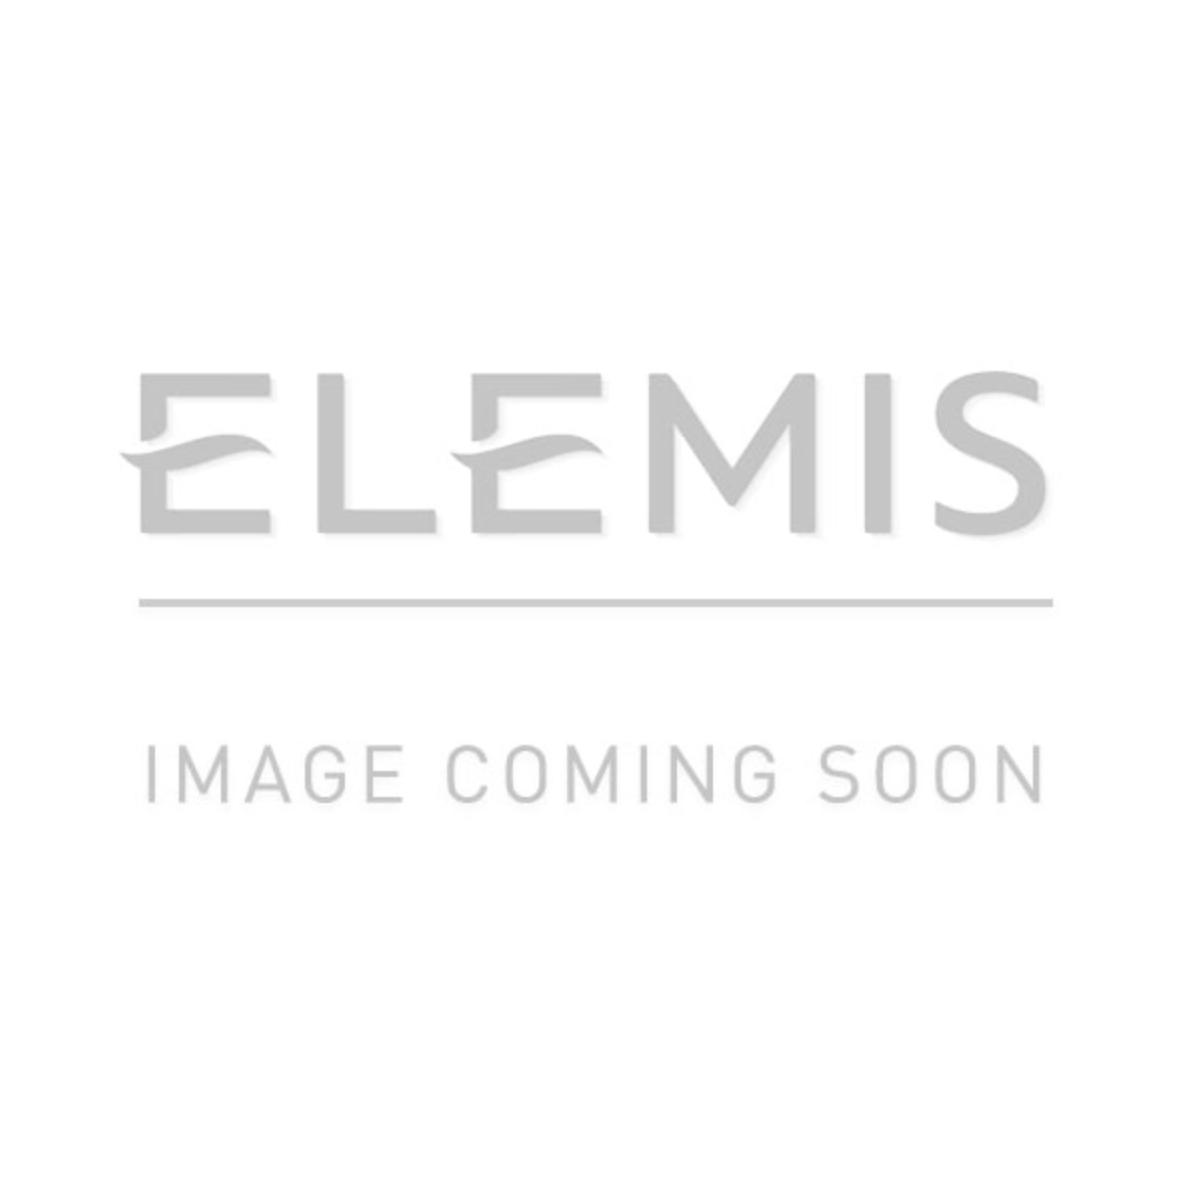 Elemis Pro-Collagen Marine Oil Texture